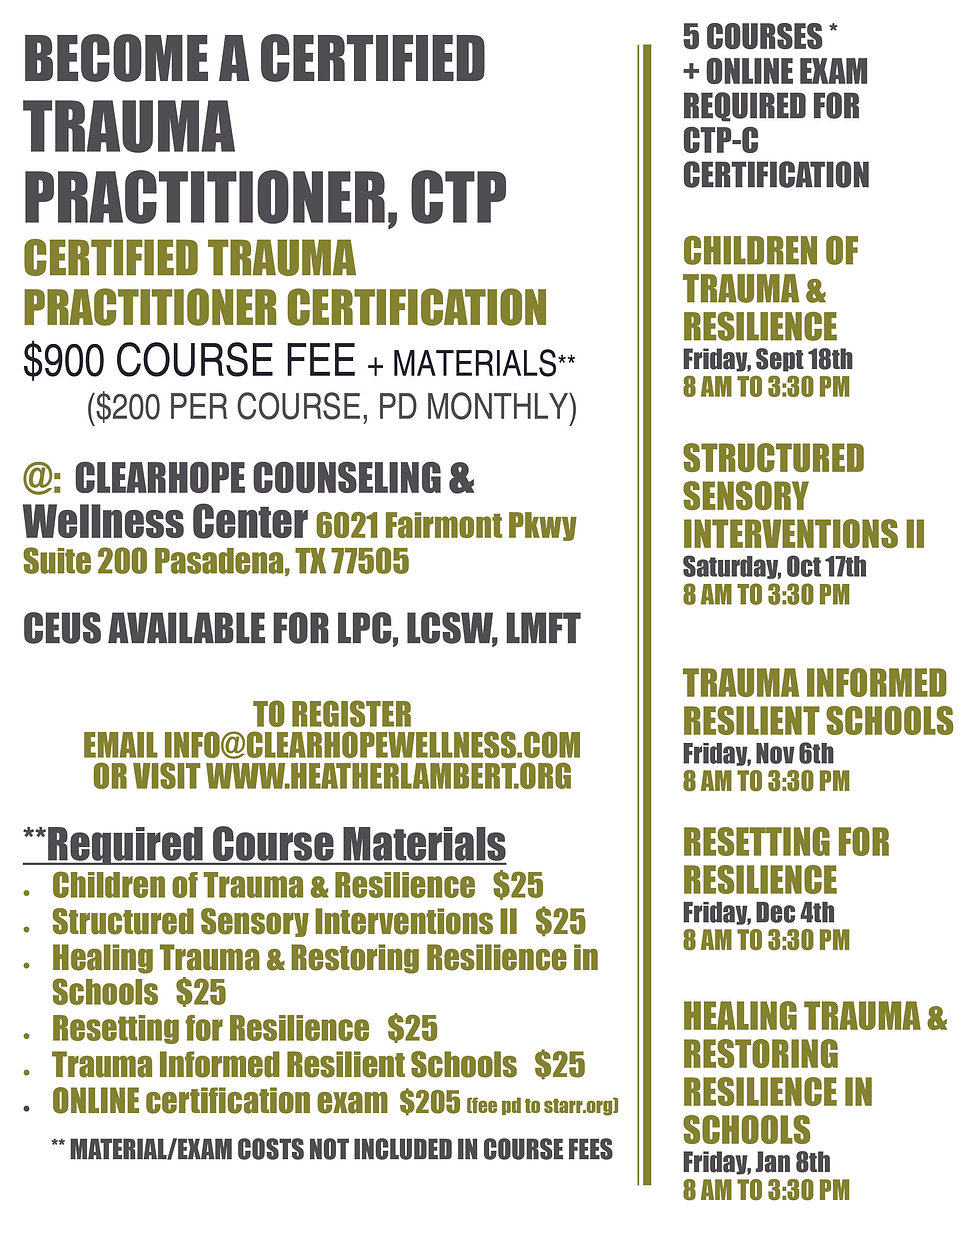 CTPC TLC Training Flyer Fall 2020_UPDATE